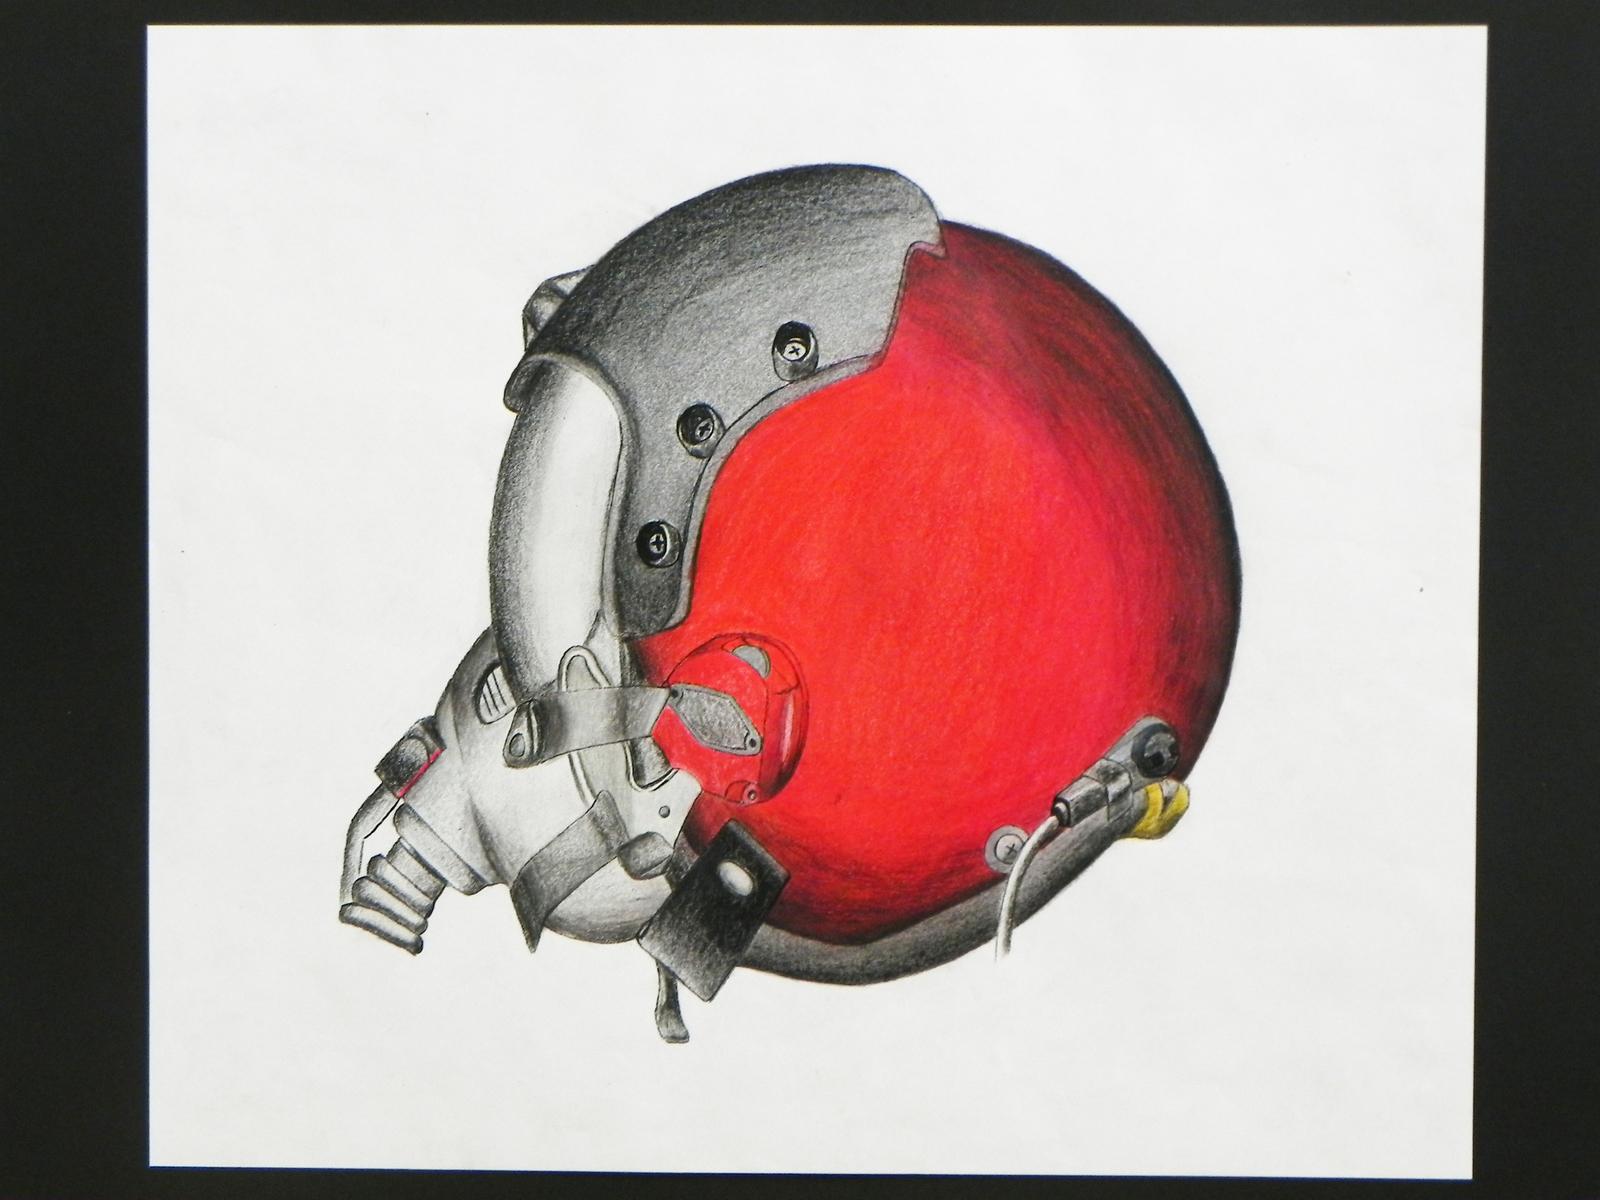 A colour pencil illustration of a fighter jet pilot's custom helmet.